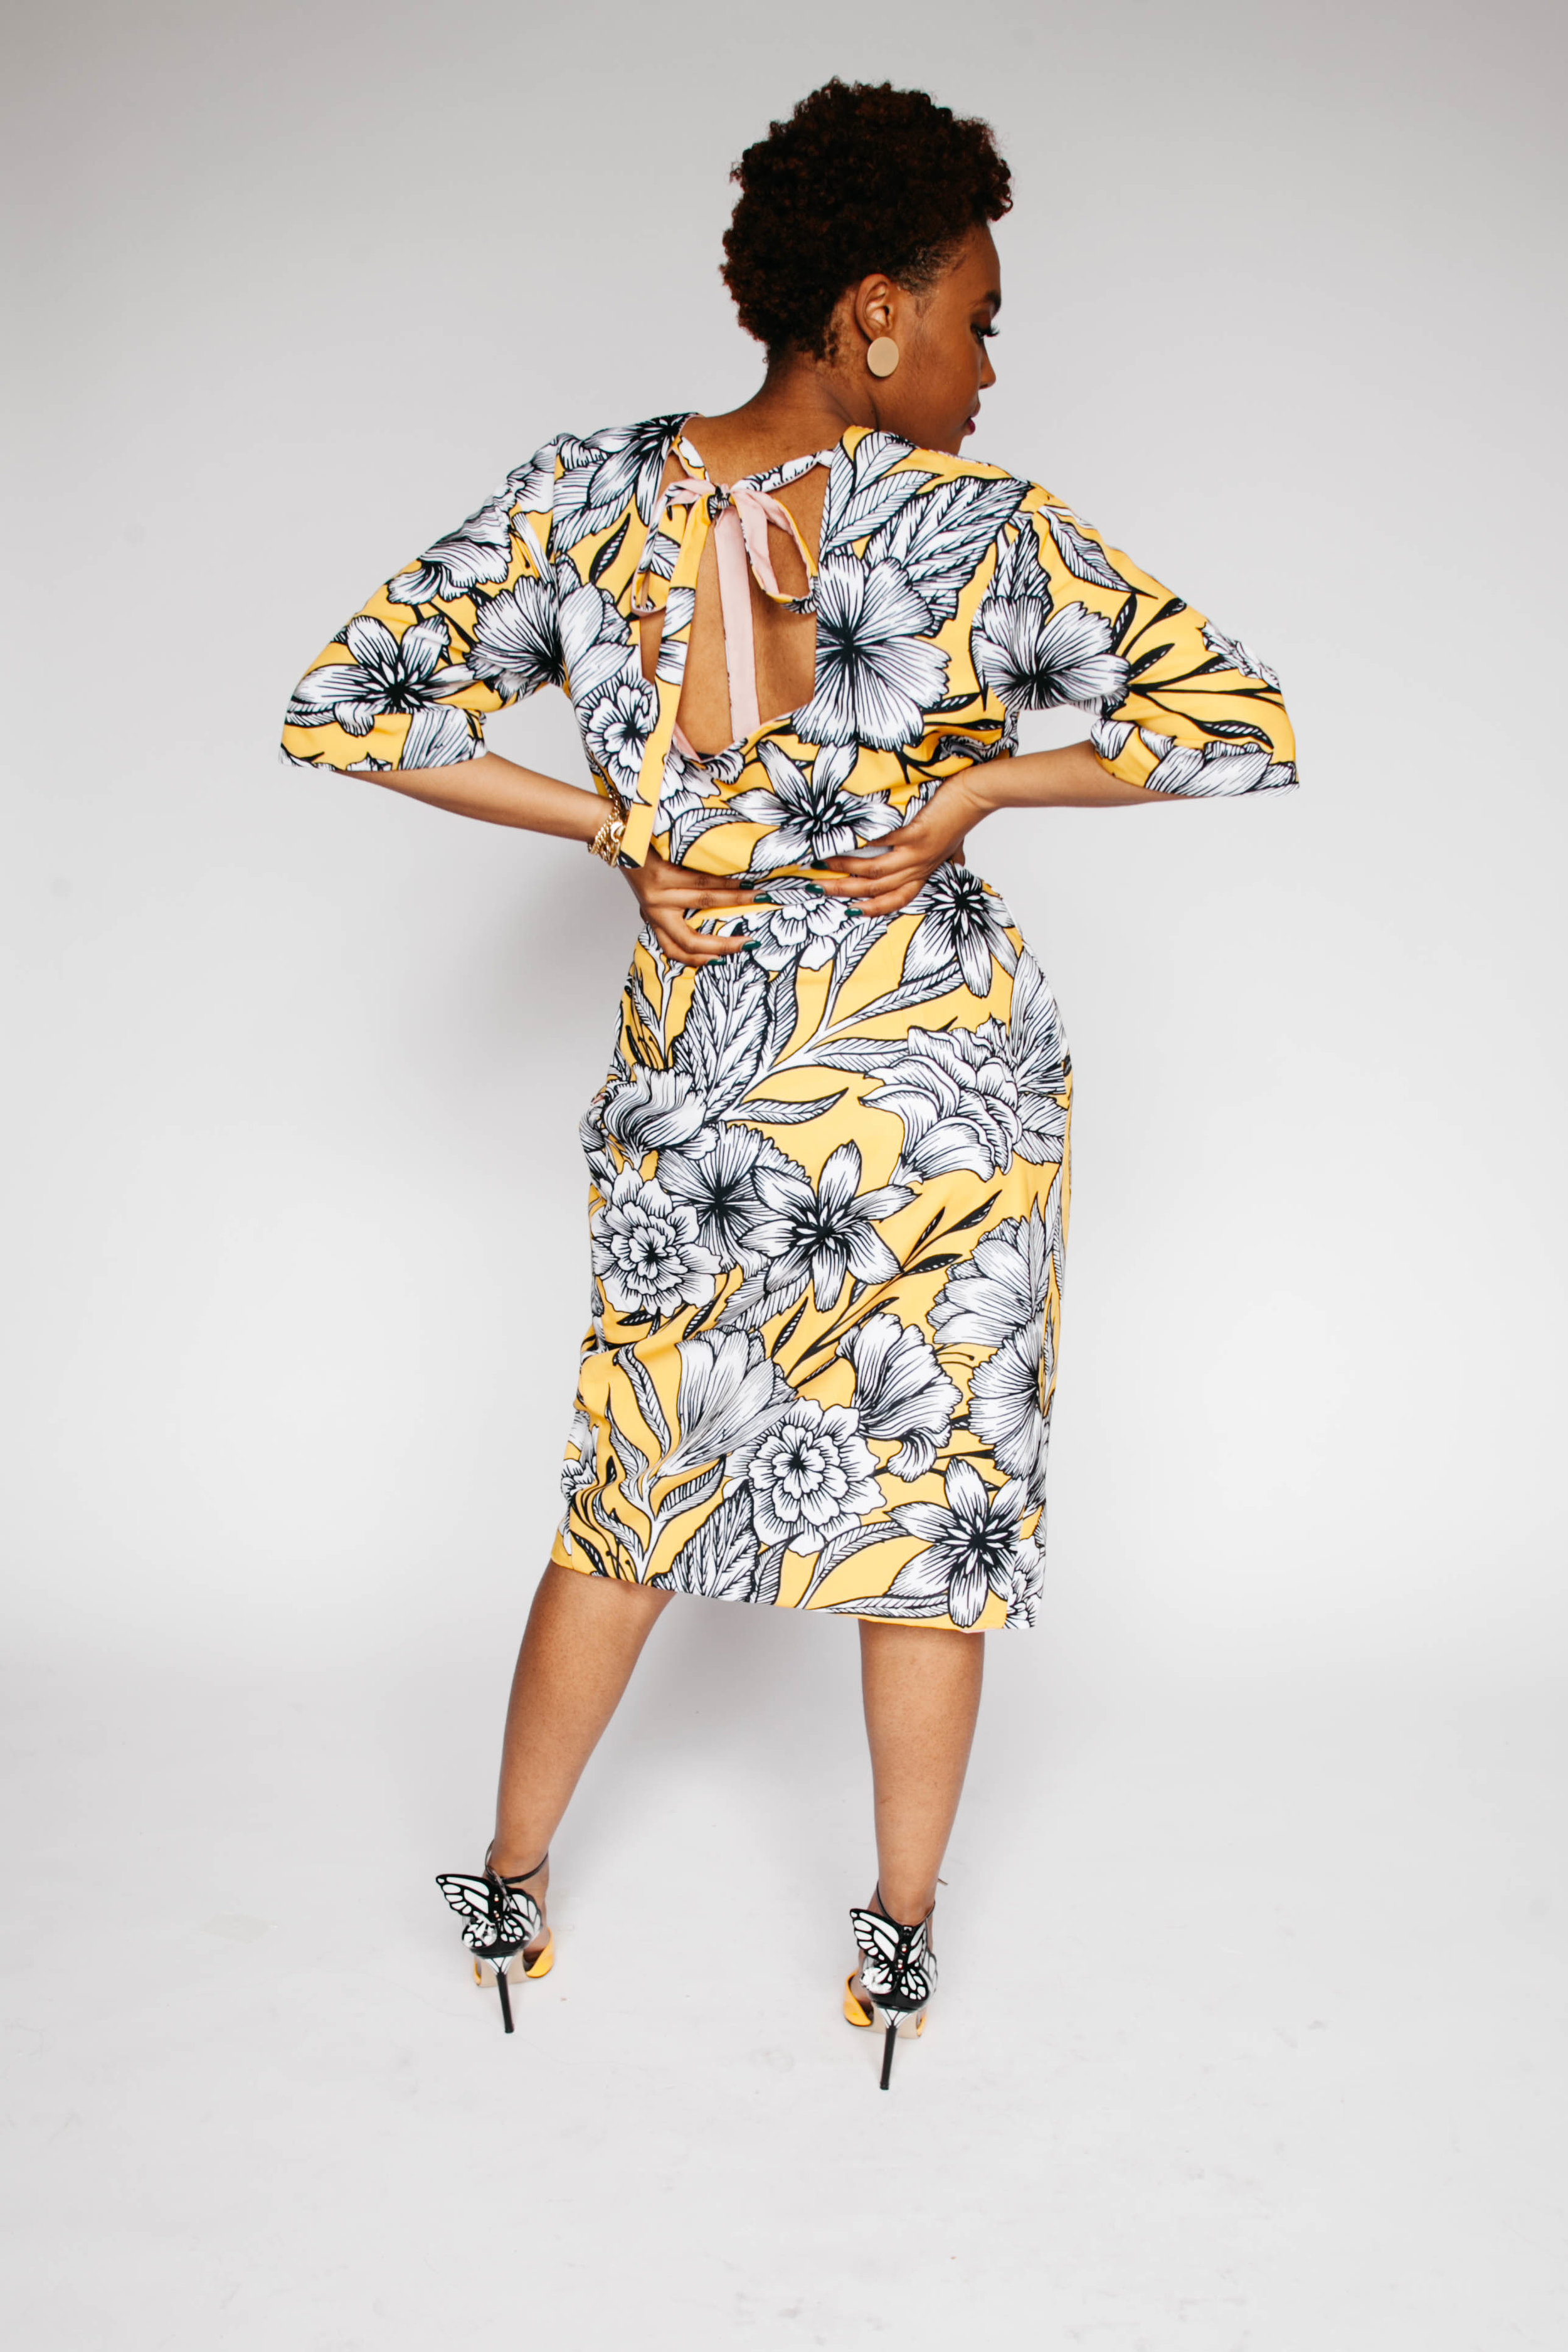 The Tiana Dress